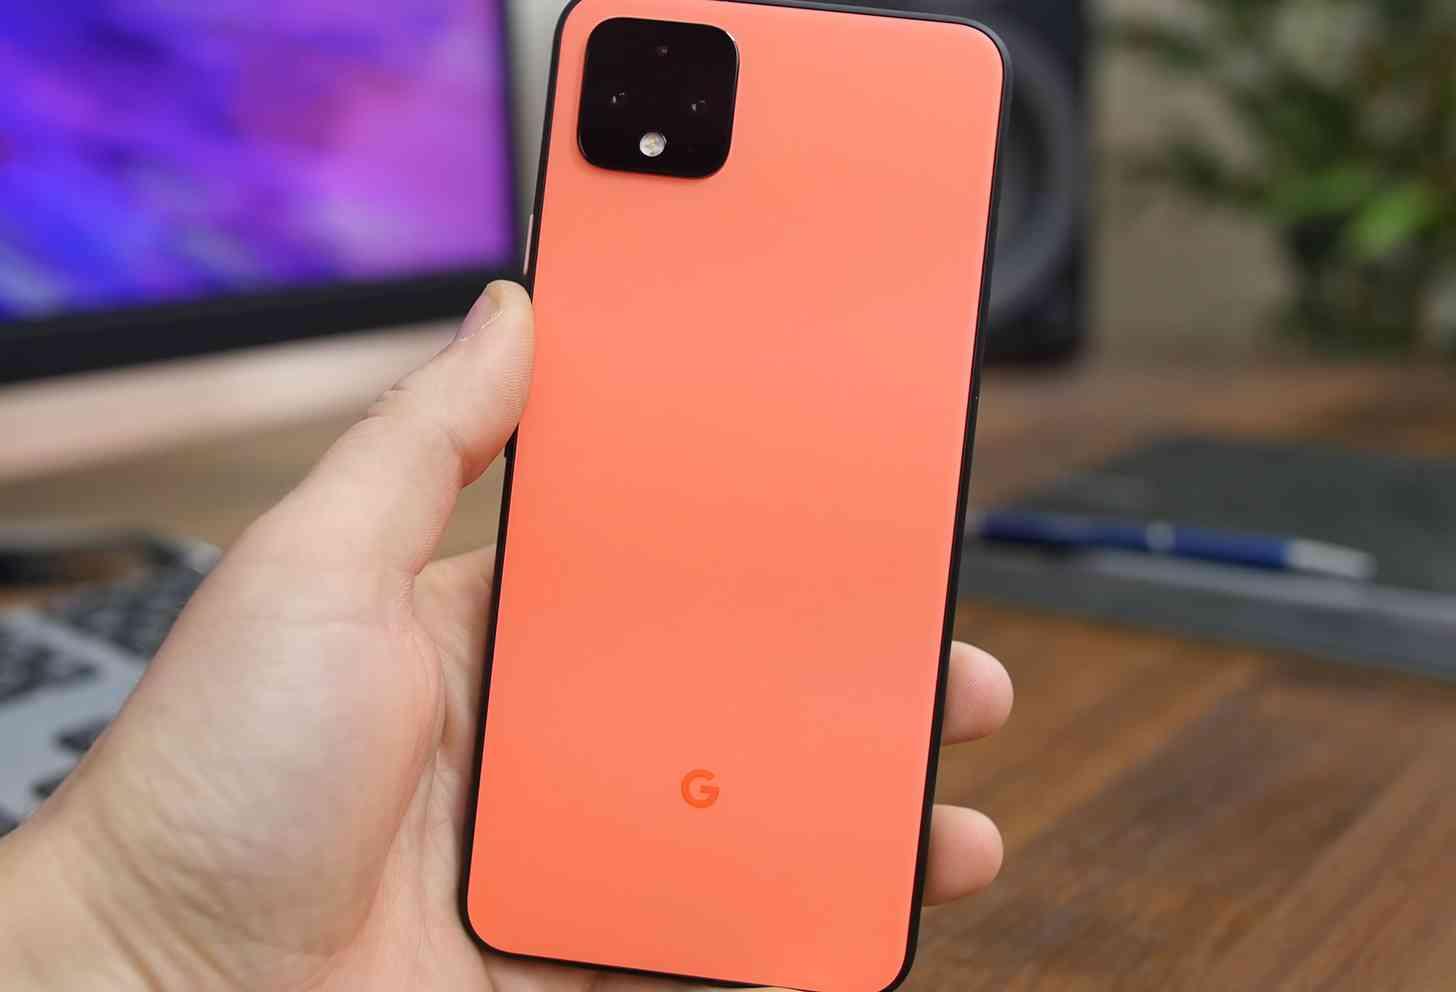 Pixel 4 XL orange